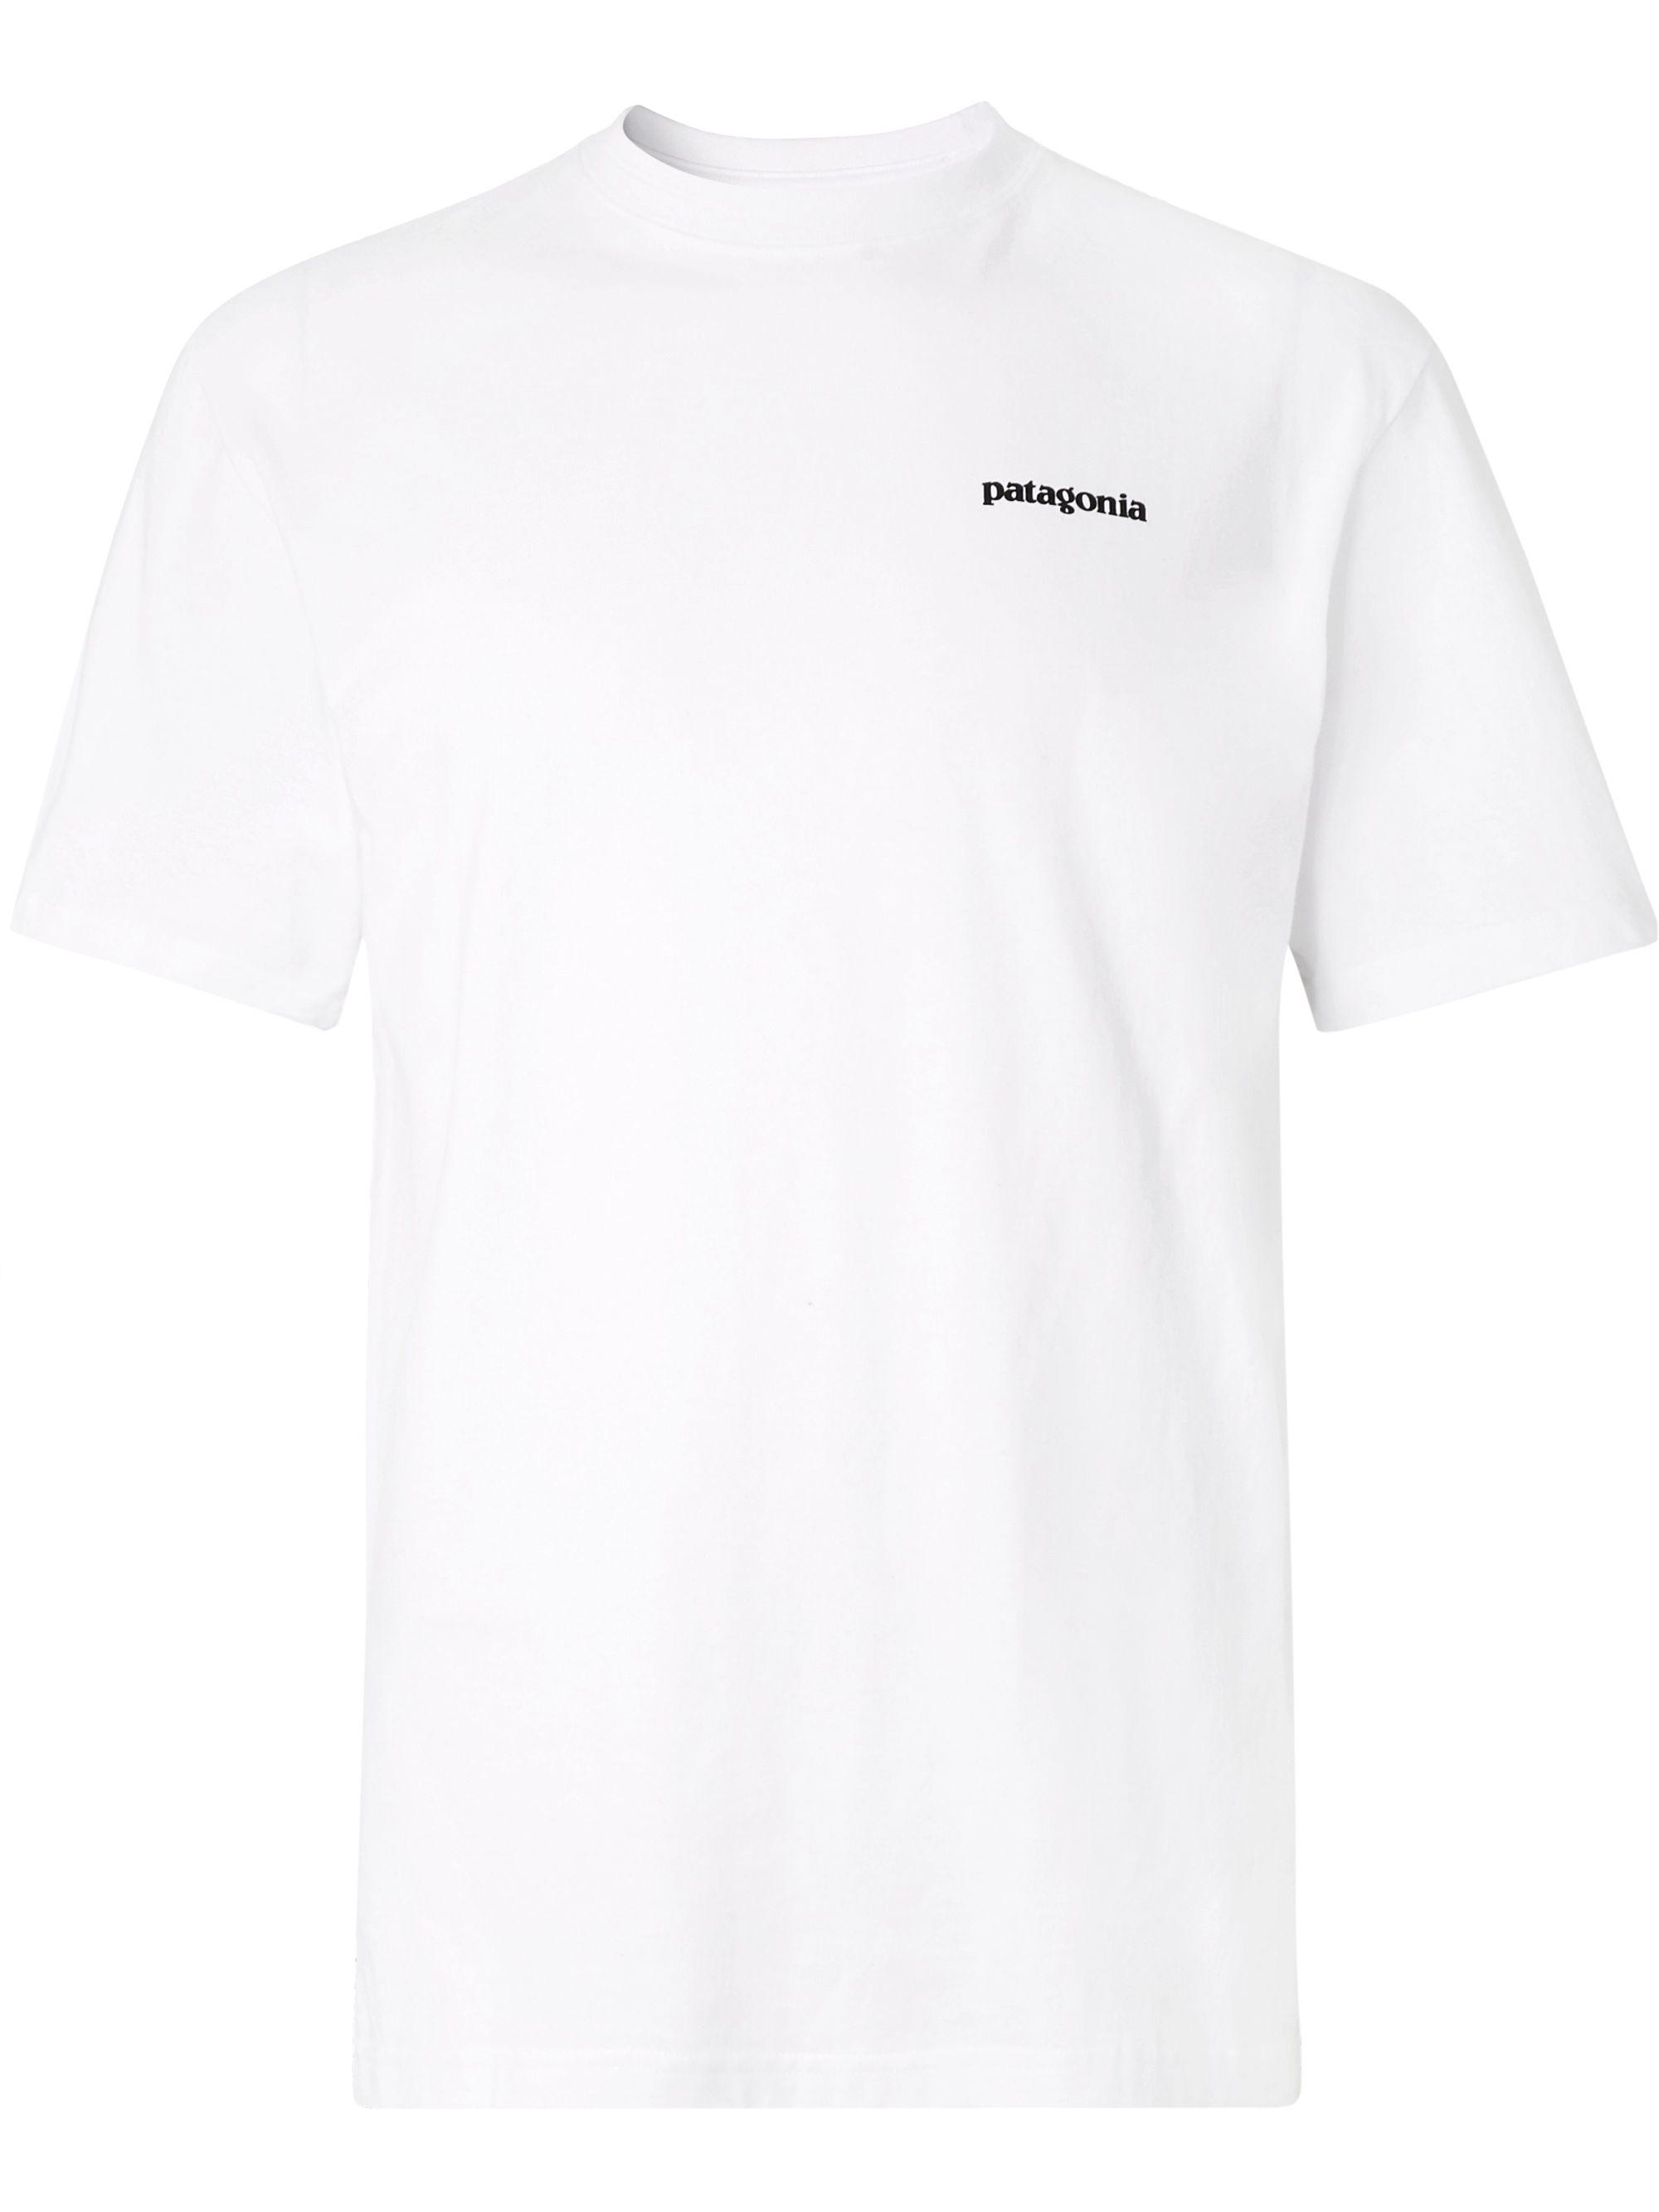 P 6 Logo Responsibili Tee Printed Cotton Blend Jersey T Shirt